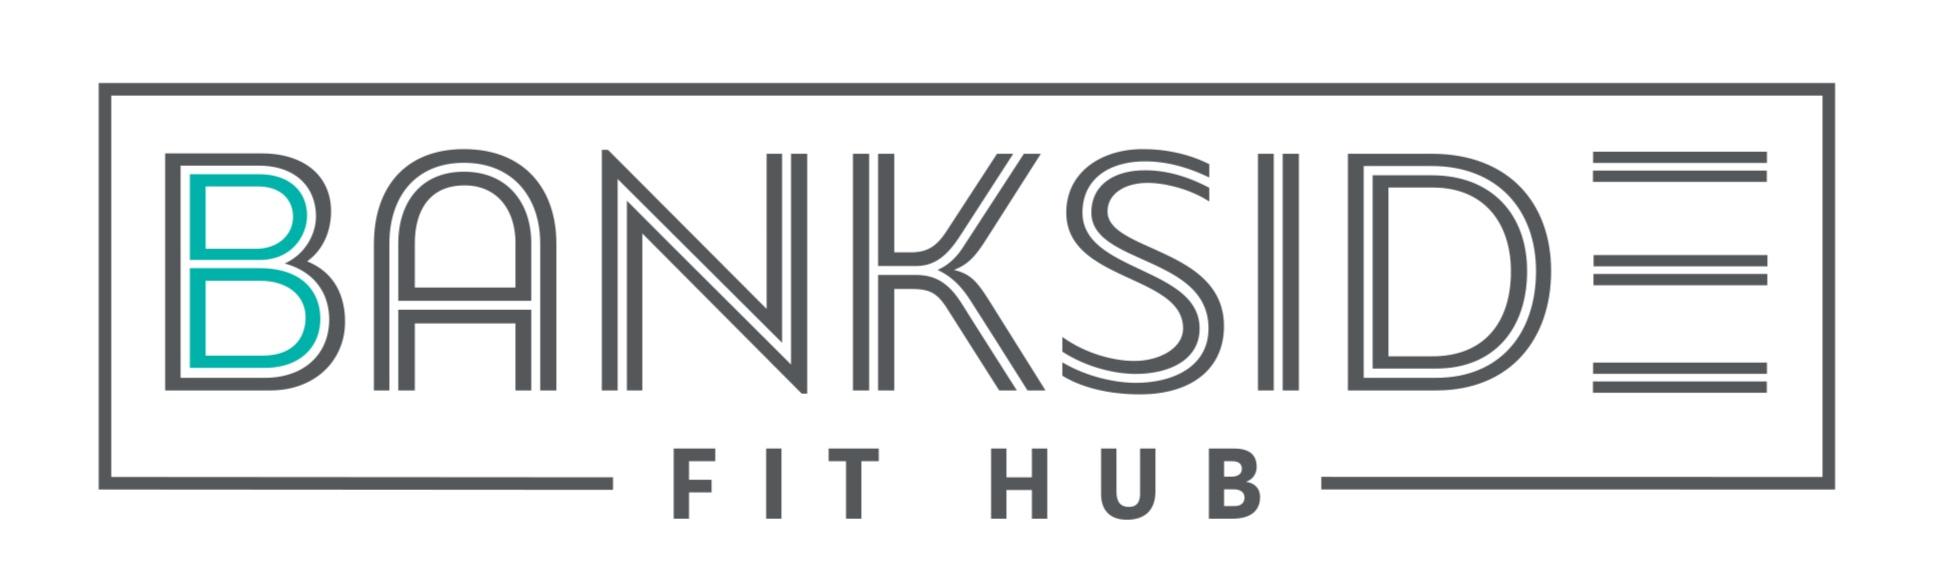 BS_FitHub_Logo2018.jpg